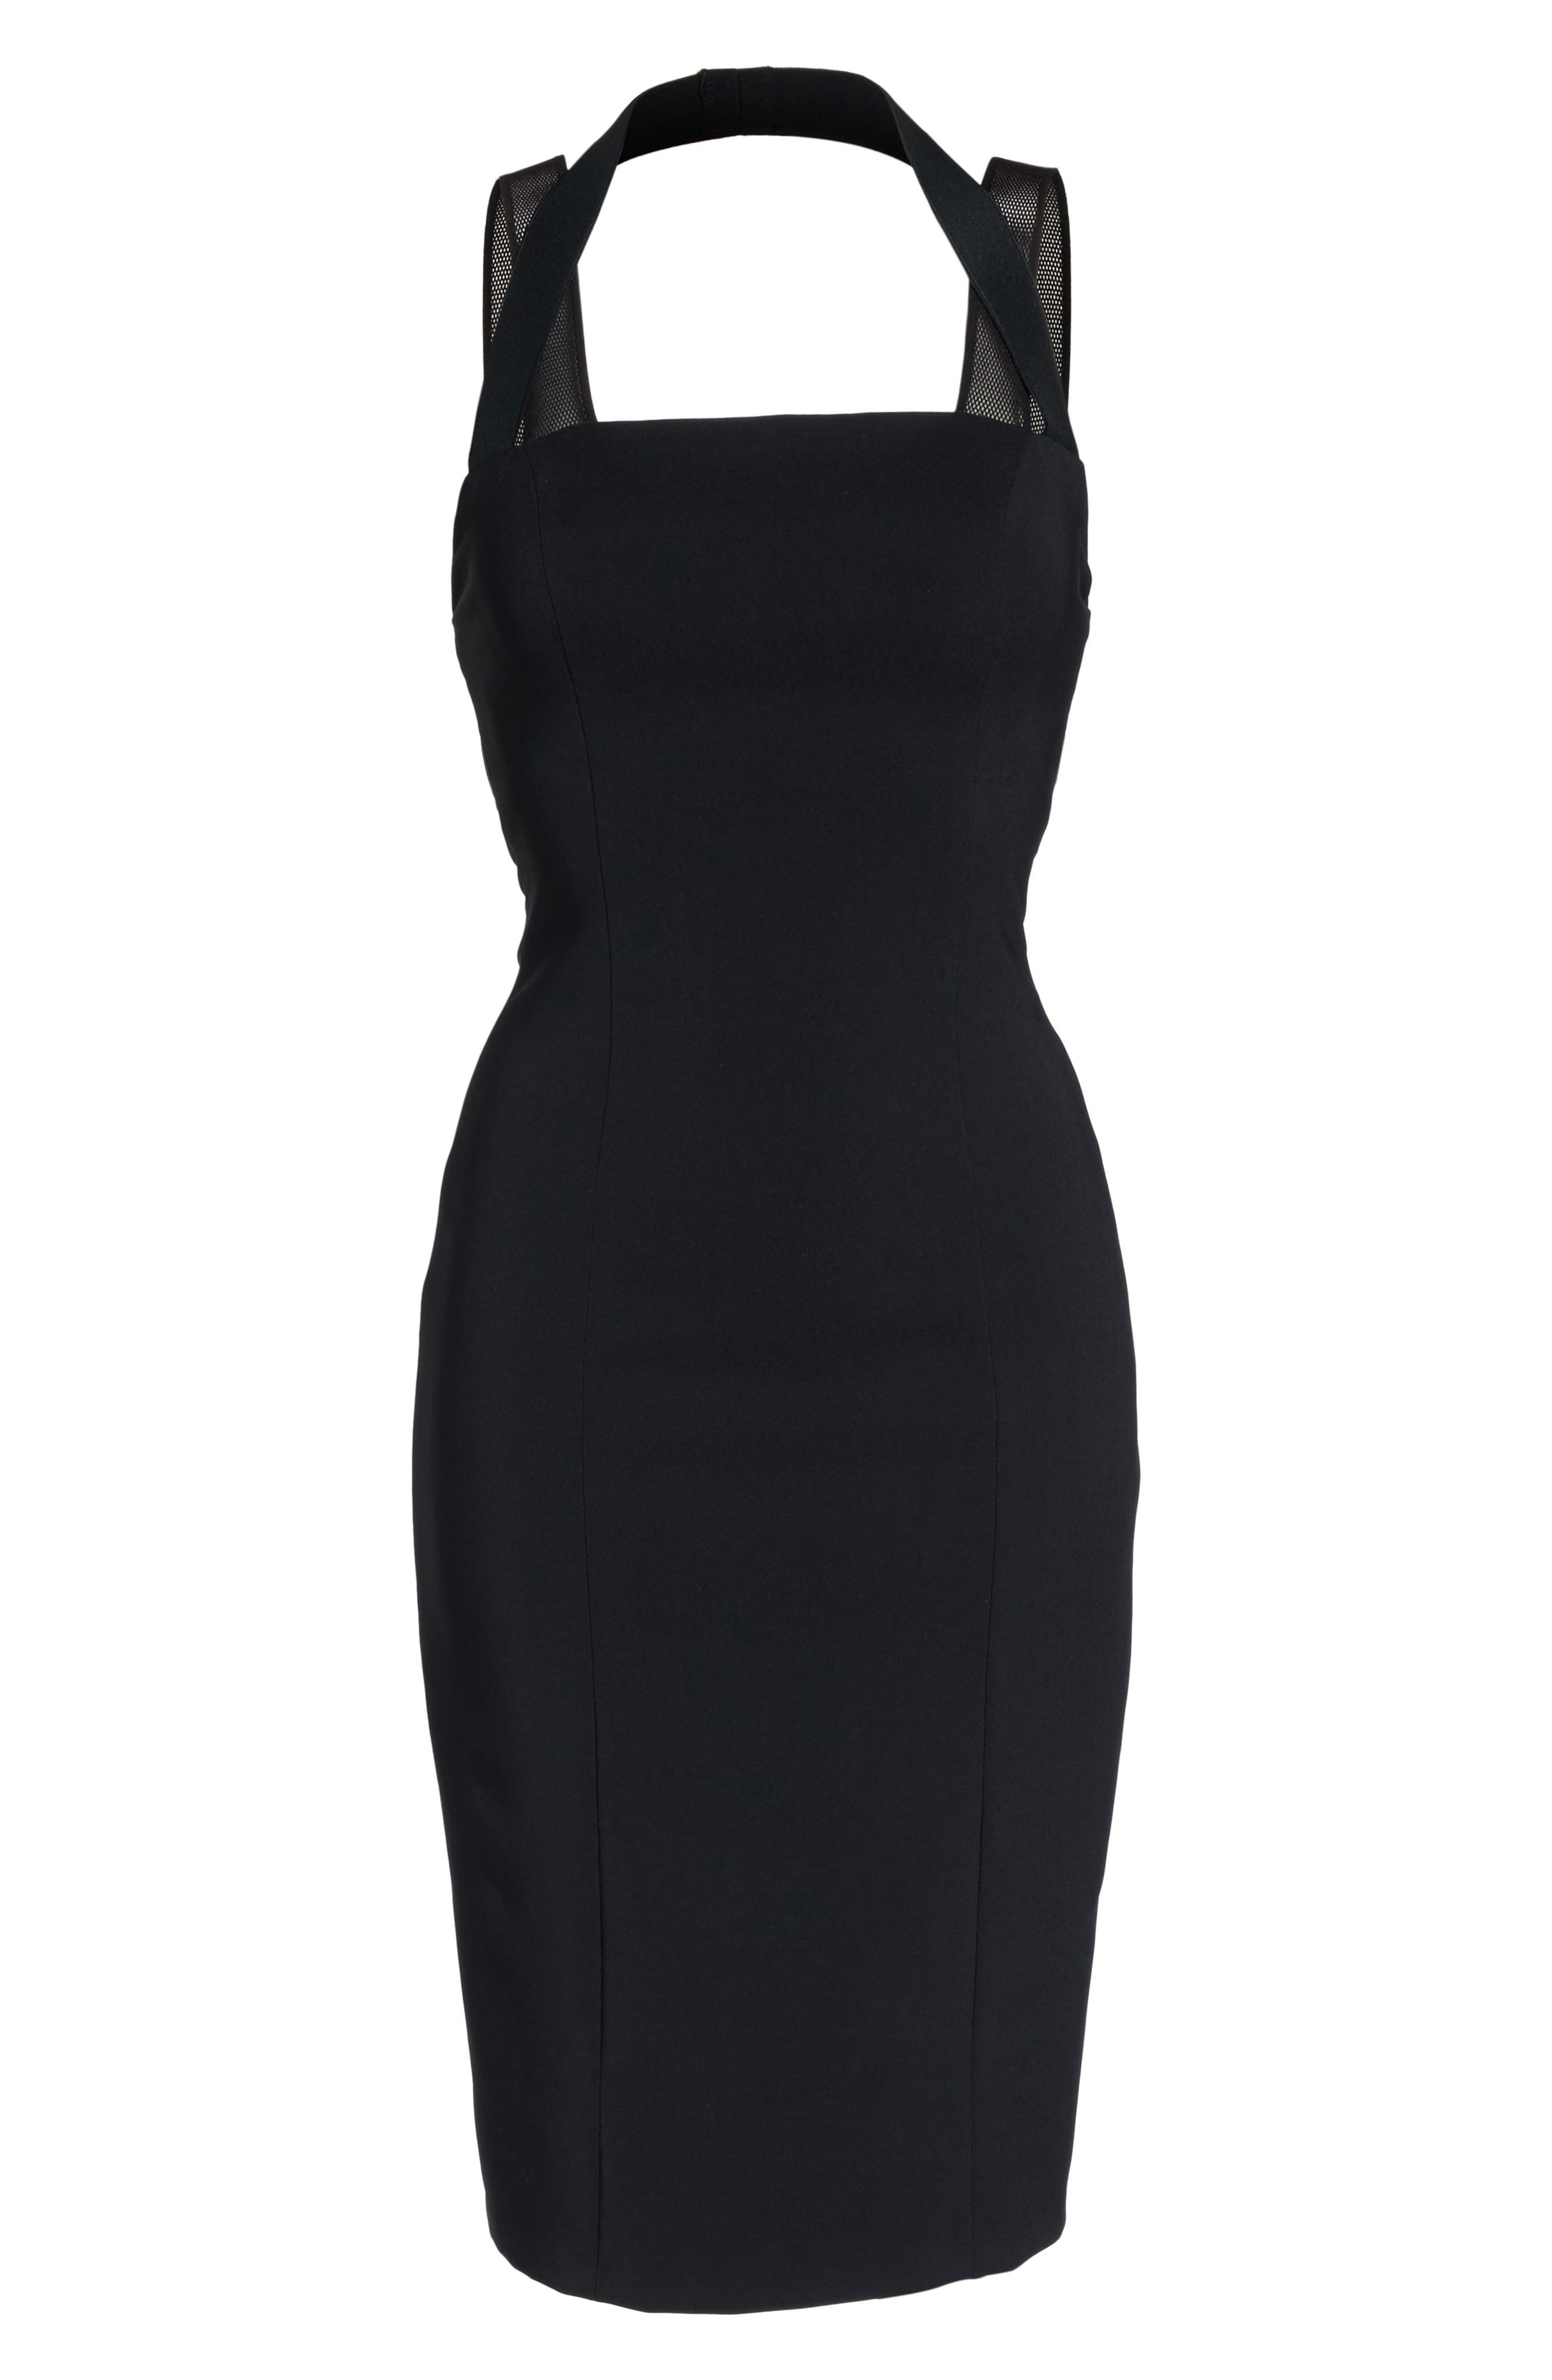 Kendra Elastic Strap Low Back Sheath Dress,                             Alternate thumbnail 6, color,                             Black